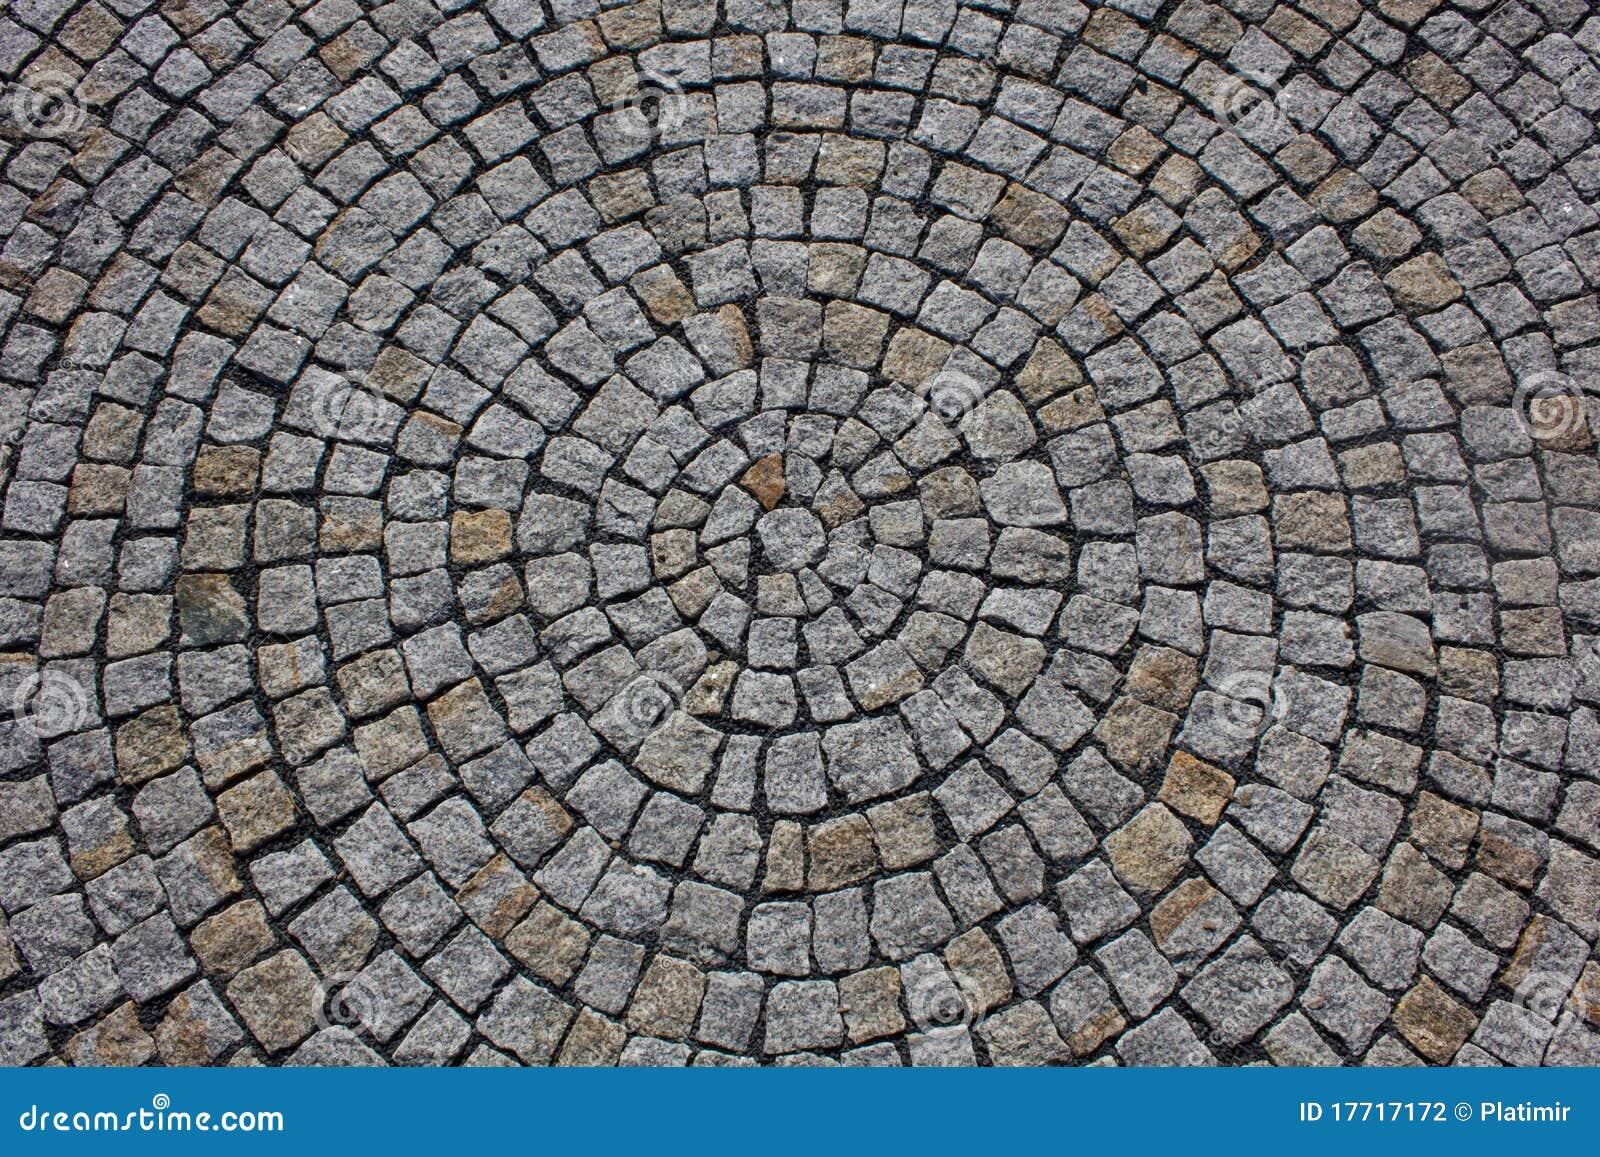 Paving Stones Texture Stock Photo Image Of City Pavement